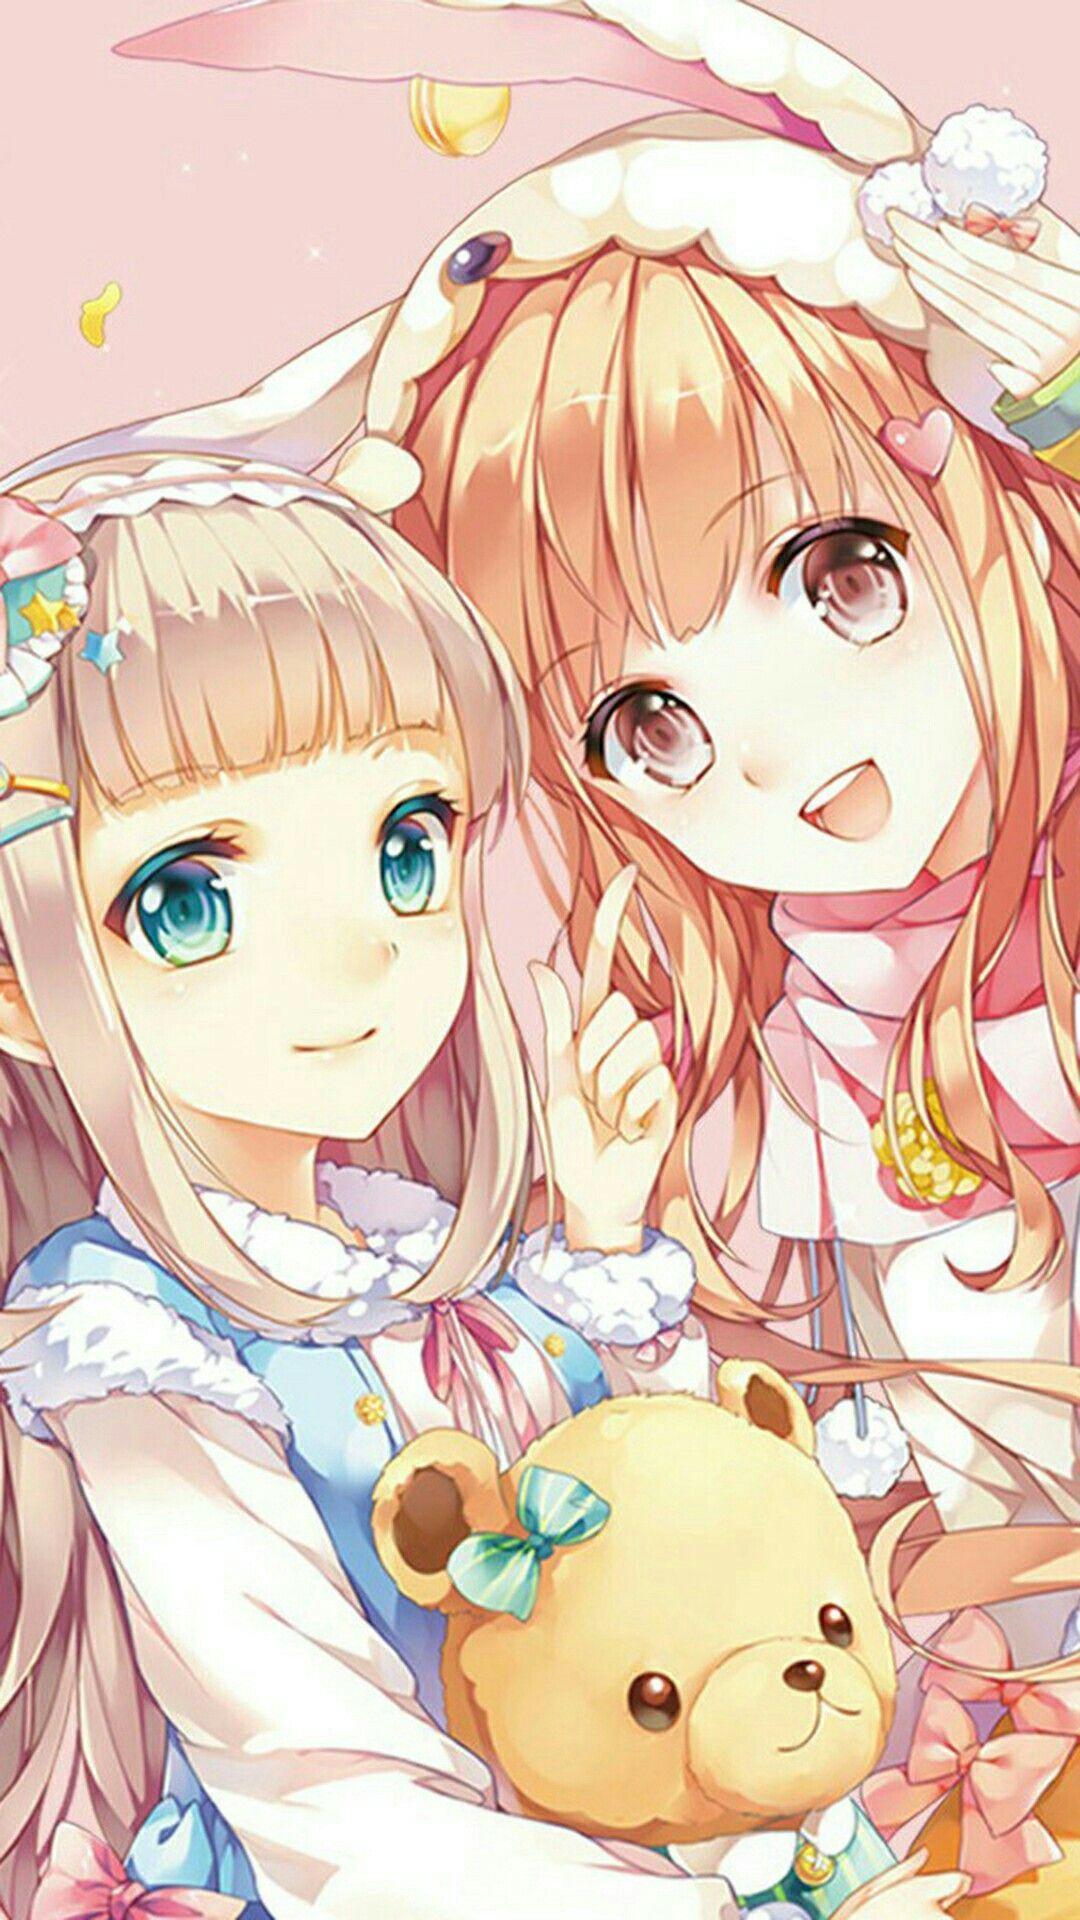 Baka To Test To Shoukanjuu Mini Anime English Sub